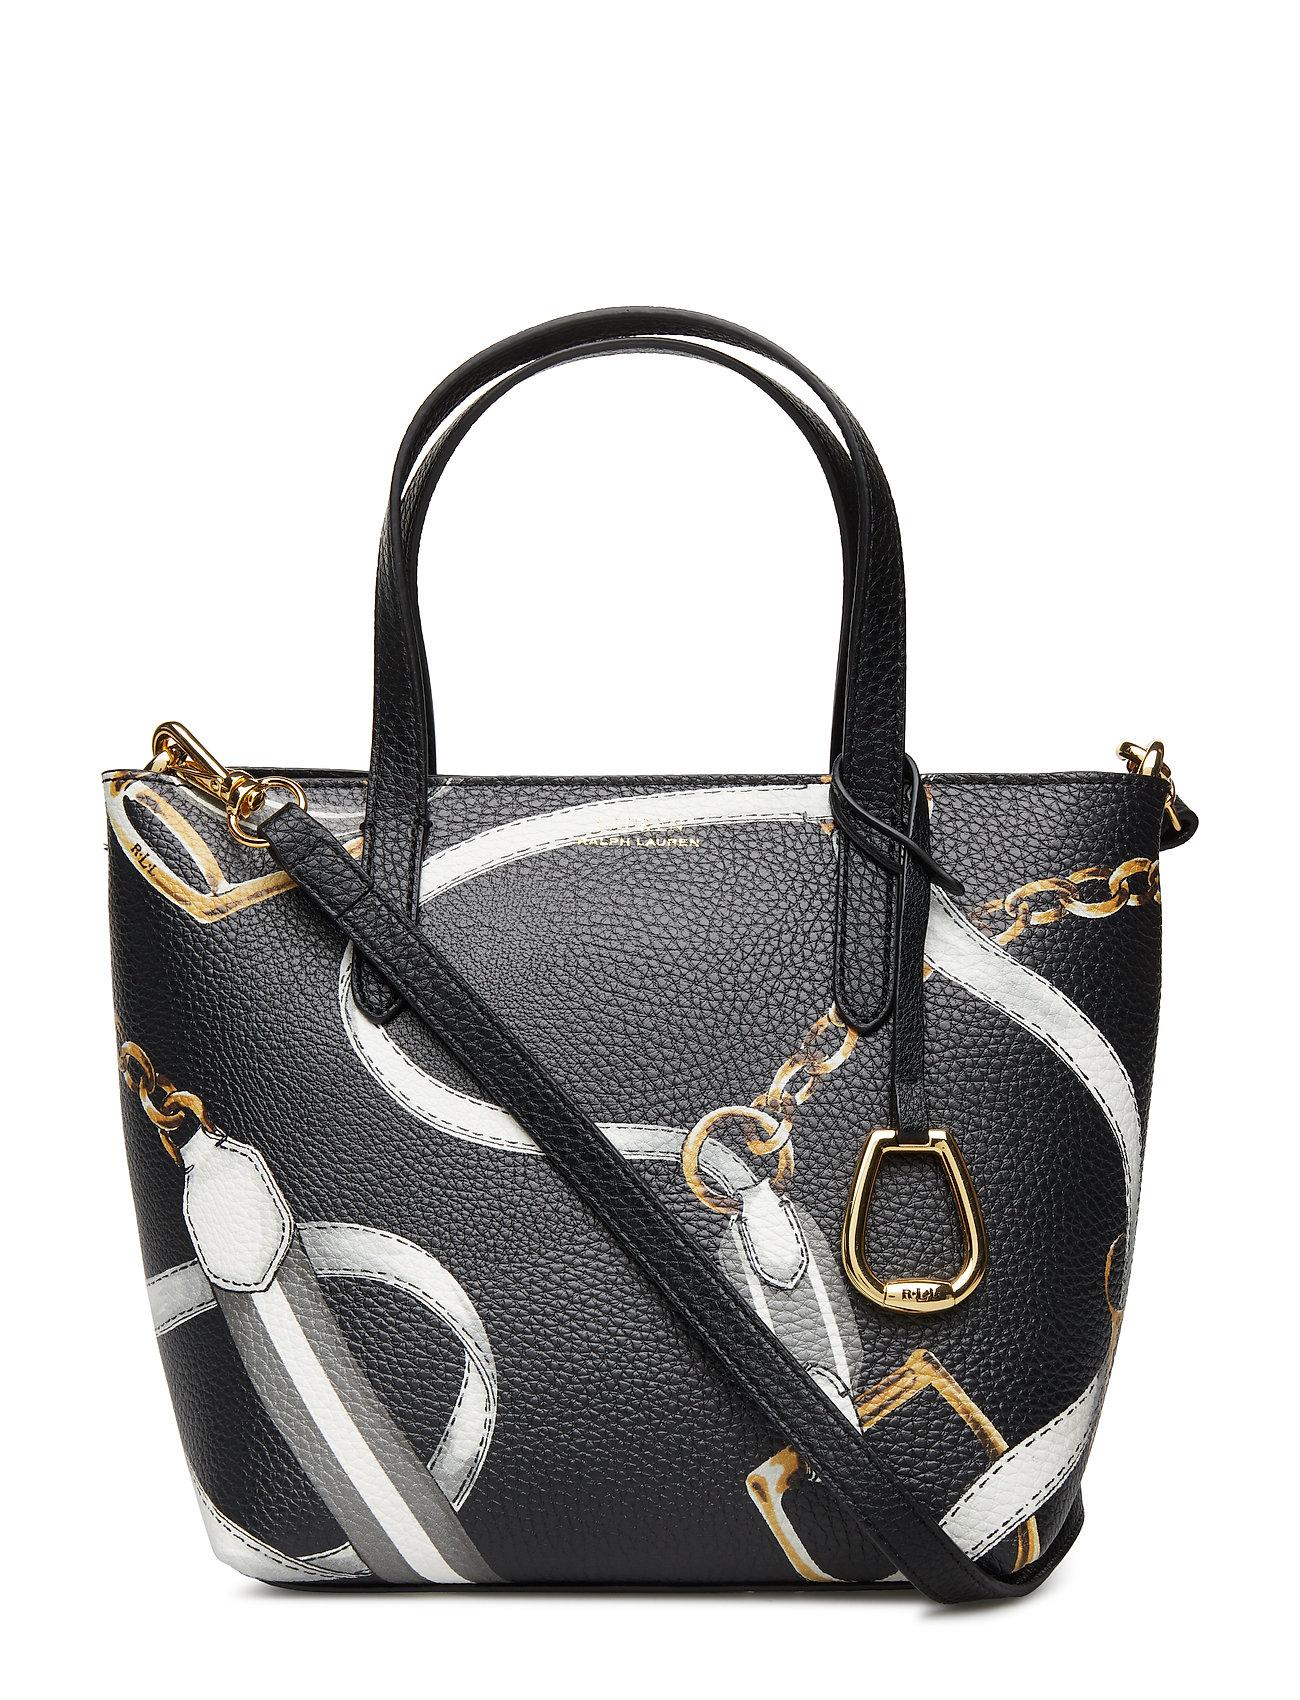 d0f31e965f07 Faux-leather Crossbody Tote (Black Sig Belting) (£145) - Lauren ...